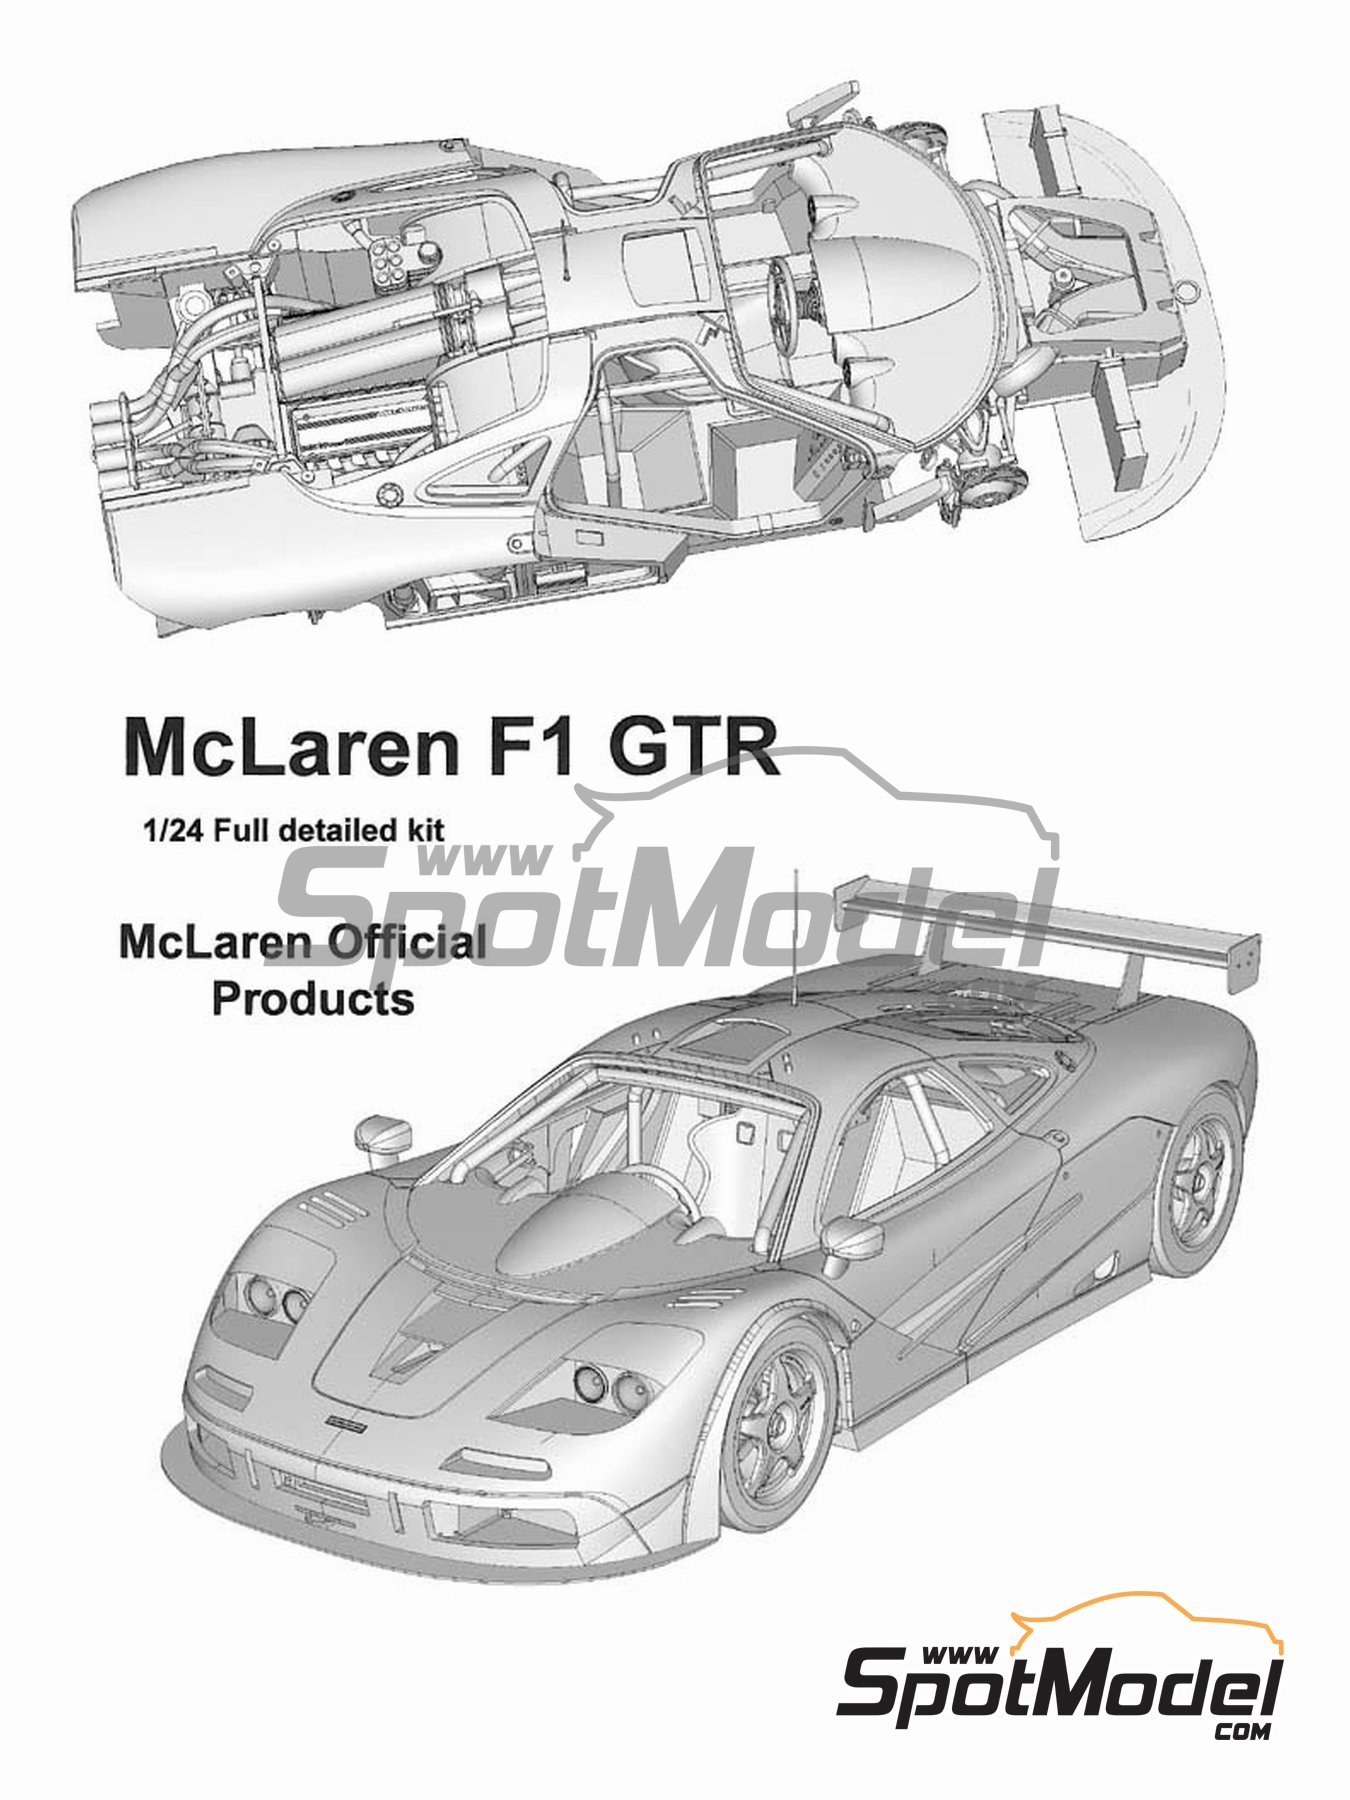 McLaren F1 GTR Team Bigazzi Srl - 24 Horas de Le Mans 1996 | Maqueta de coche en escala1/24 fabricado por Model Factory Hiro (ref.MFH-K362, tambien K-362) image